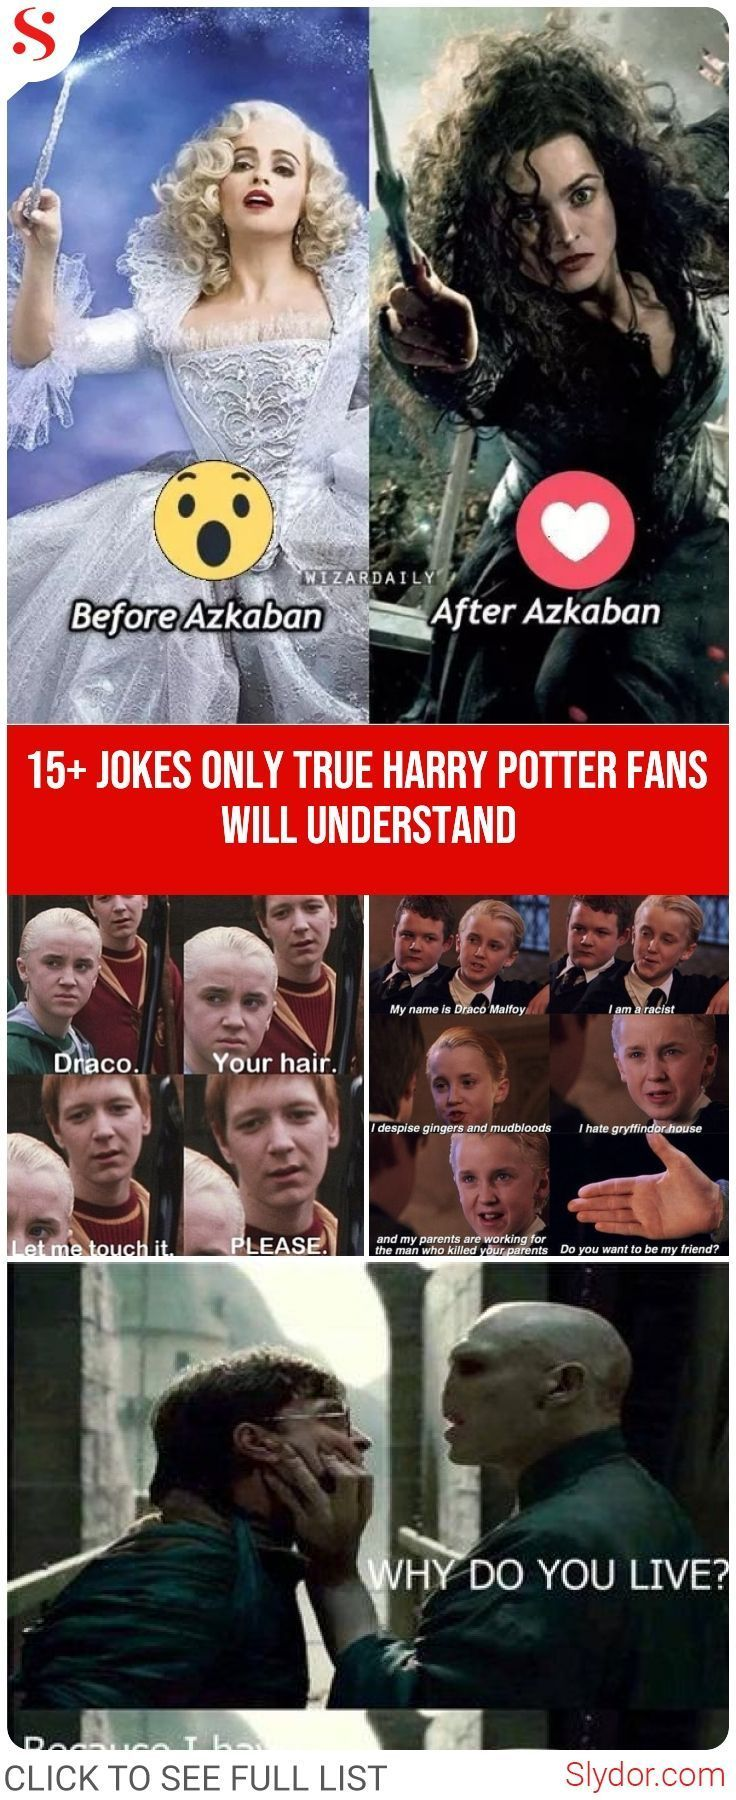 Harry Potter Memes Only A True Potterhead Can Understand Part 3 Harrypottermeme Harry Harry Potter Memes Hilarious Harry Potter Jokes Harry Potter Funny